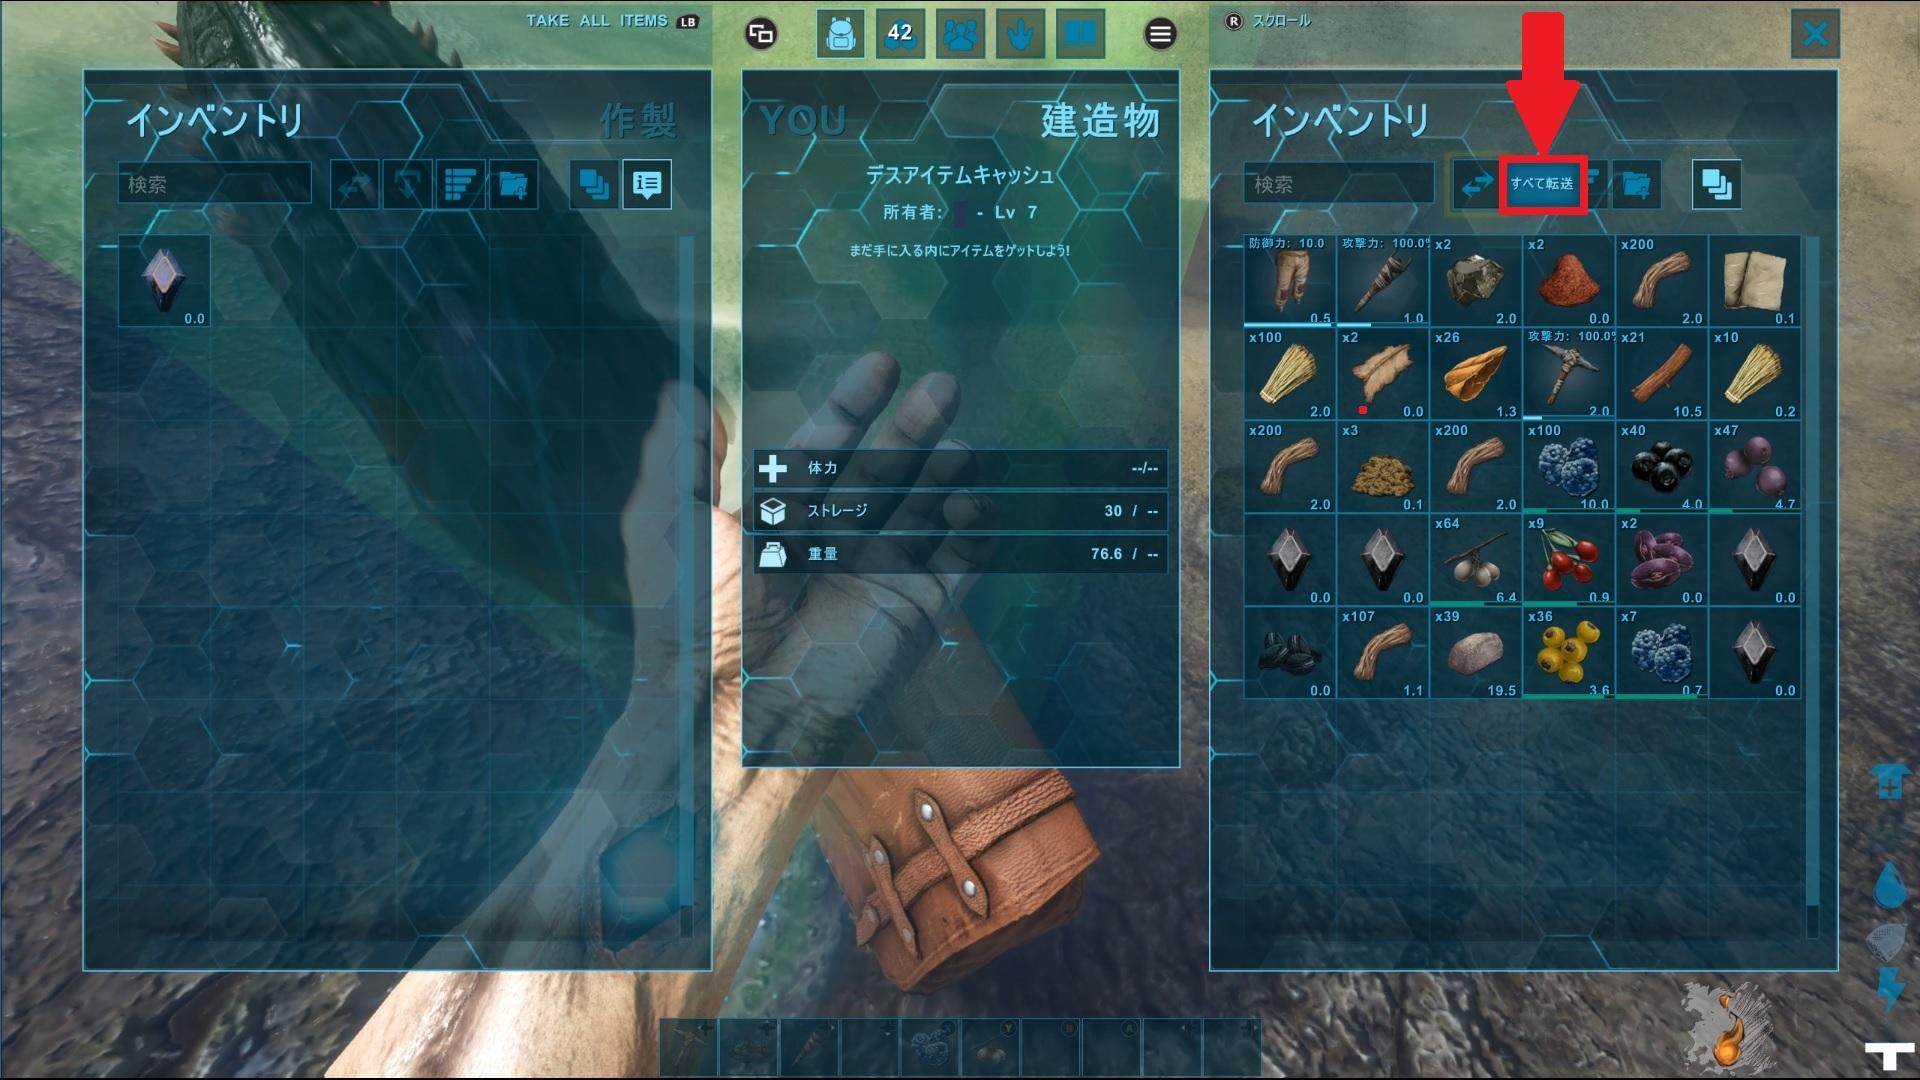 11c92616e38d9a20bf8eafd1550e56dc - 【ARK Survival Evolved】序盤攻略【究極の恐竜時代を生き抜く!】